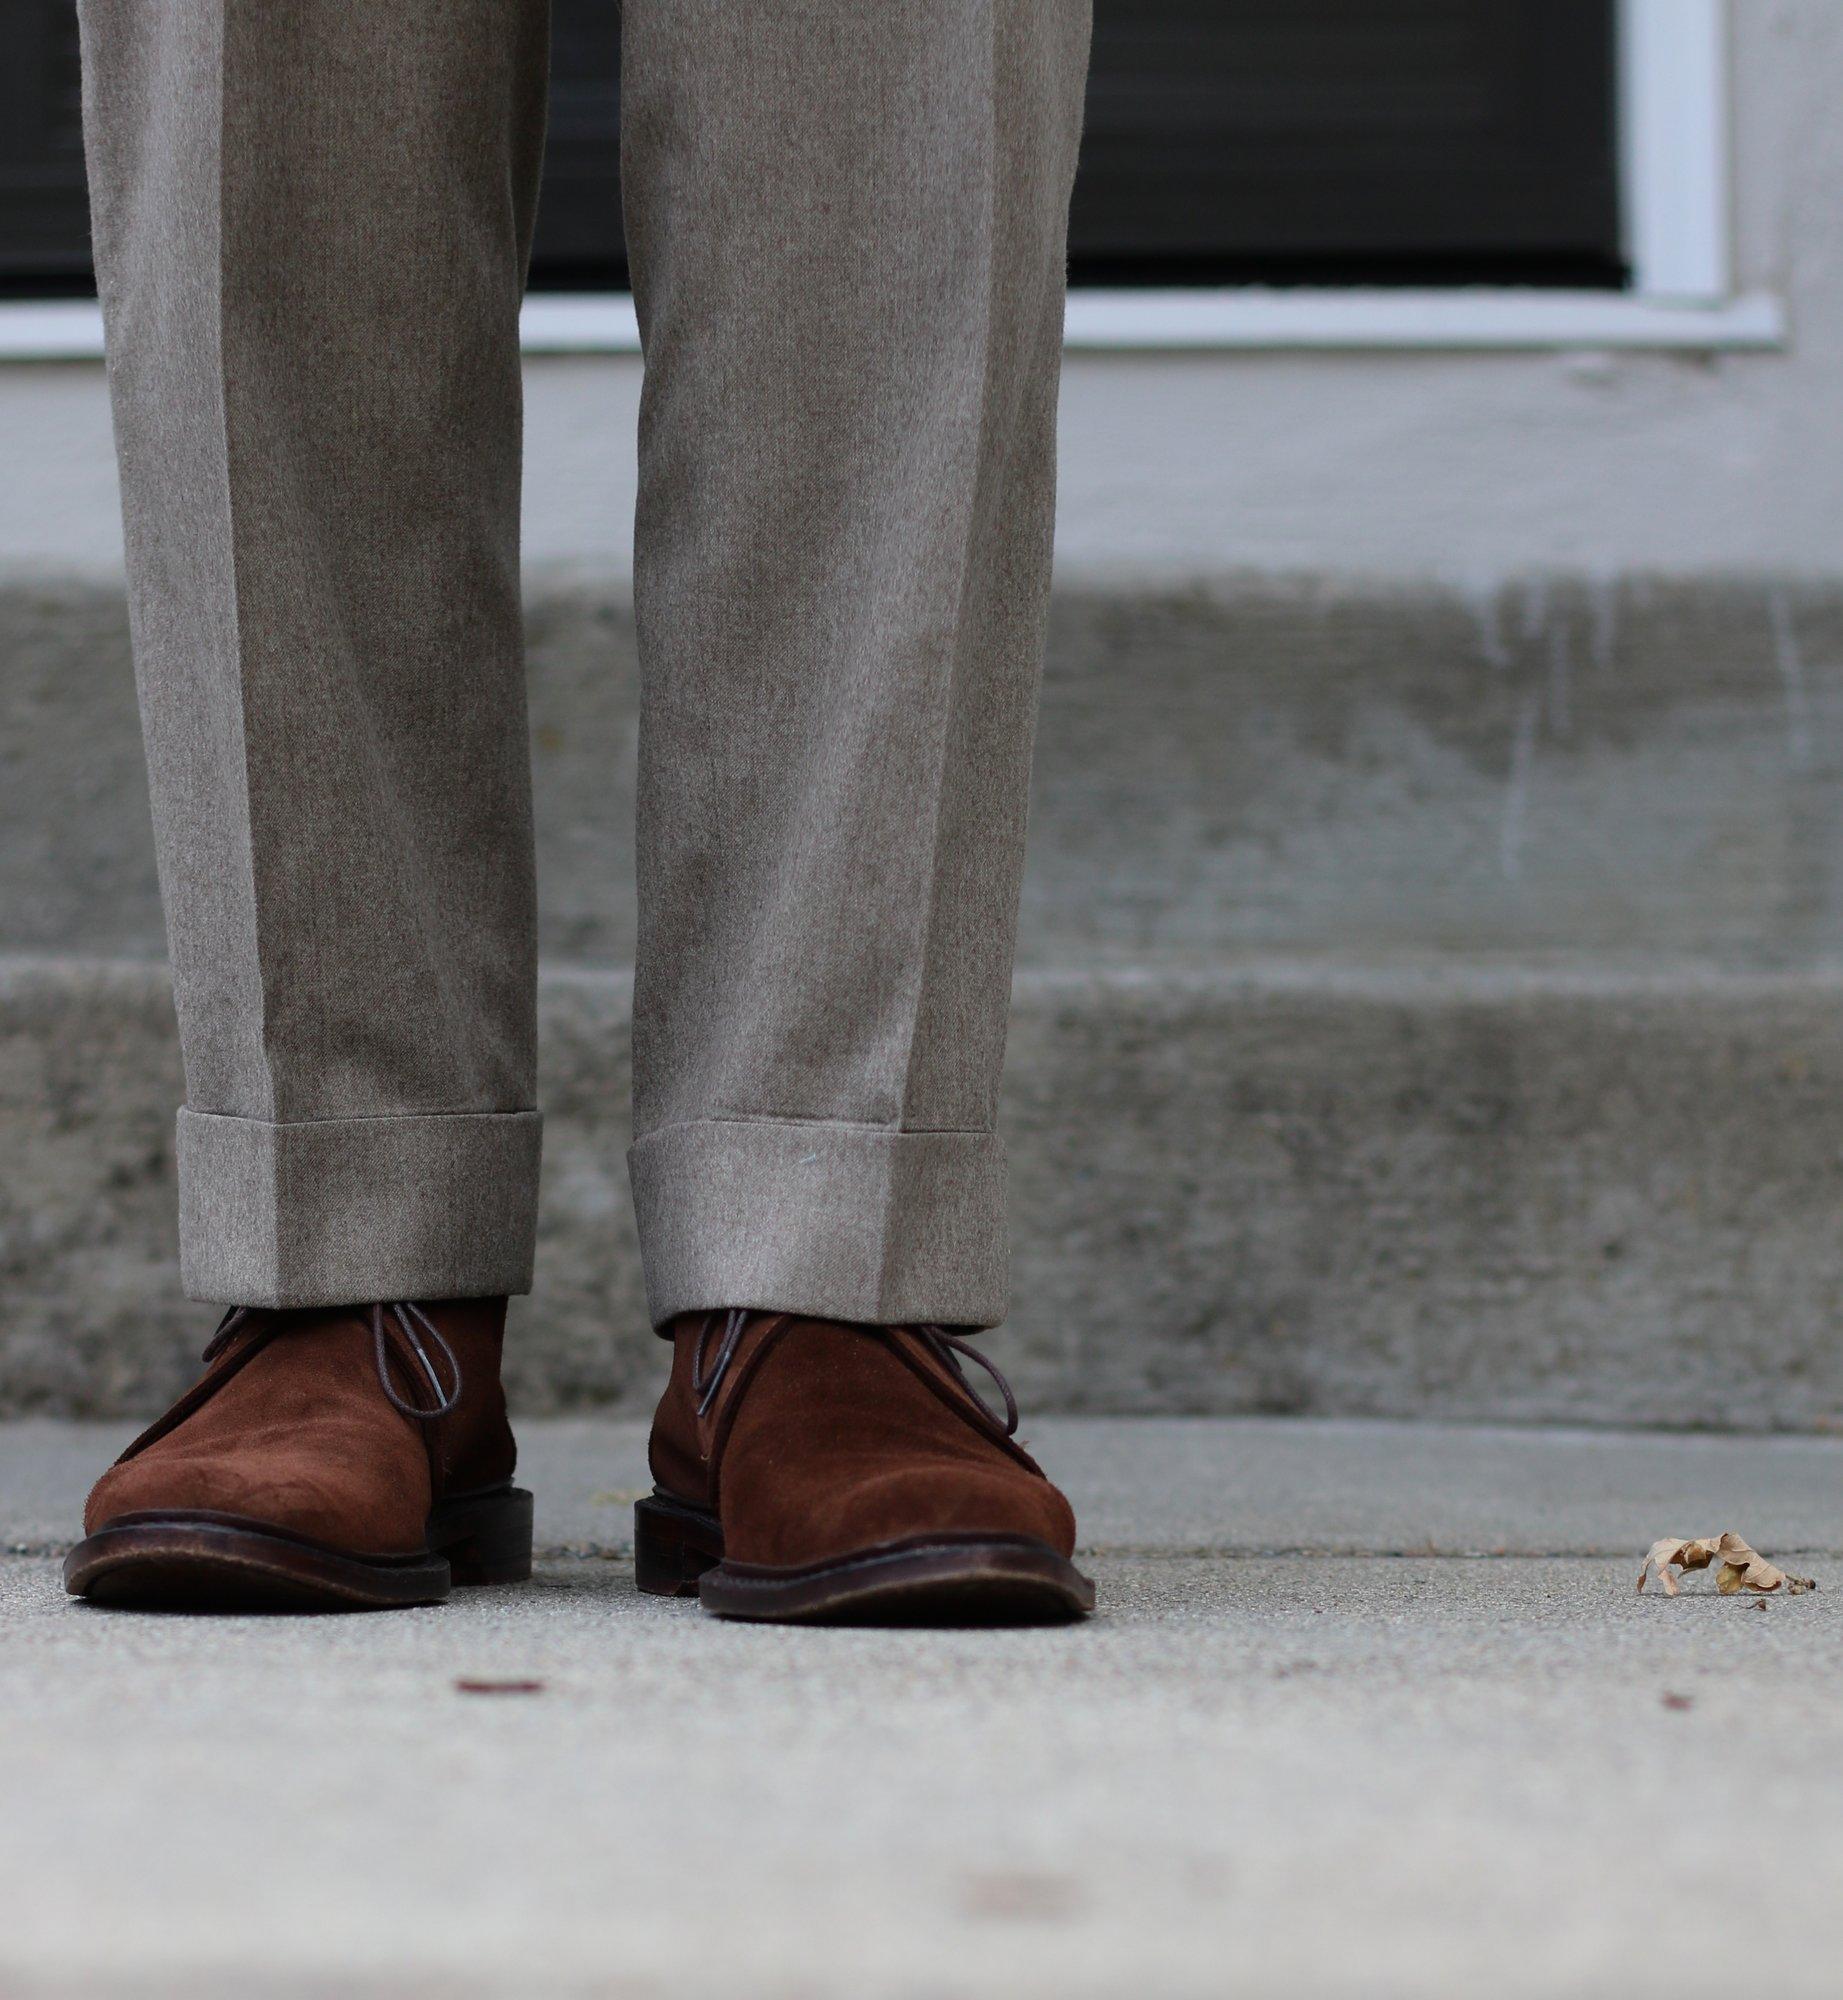 04-shoes-sf.jpg